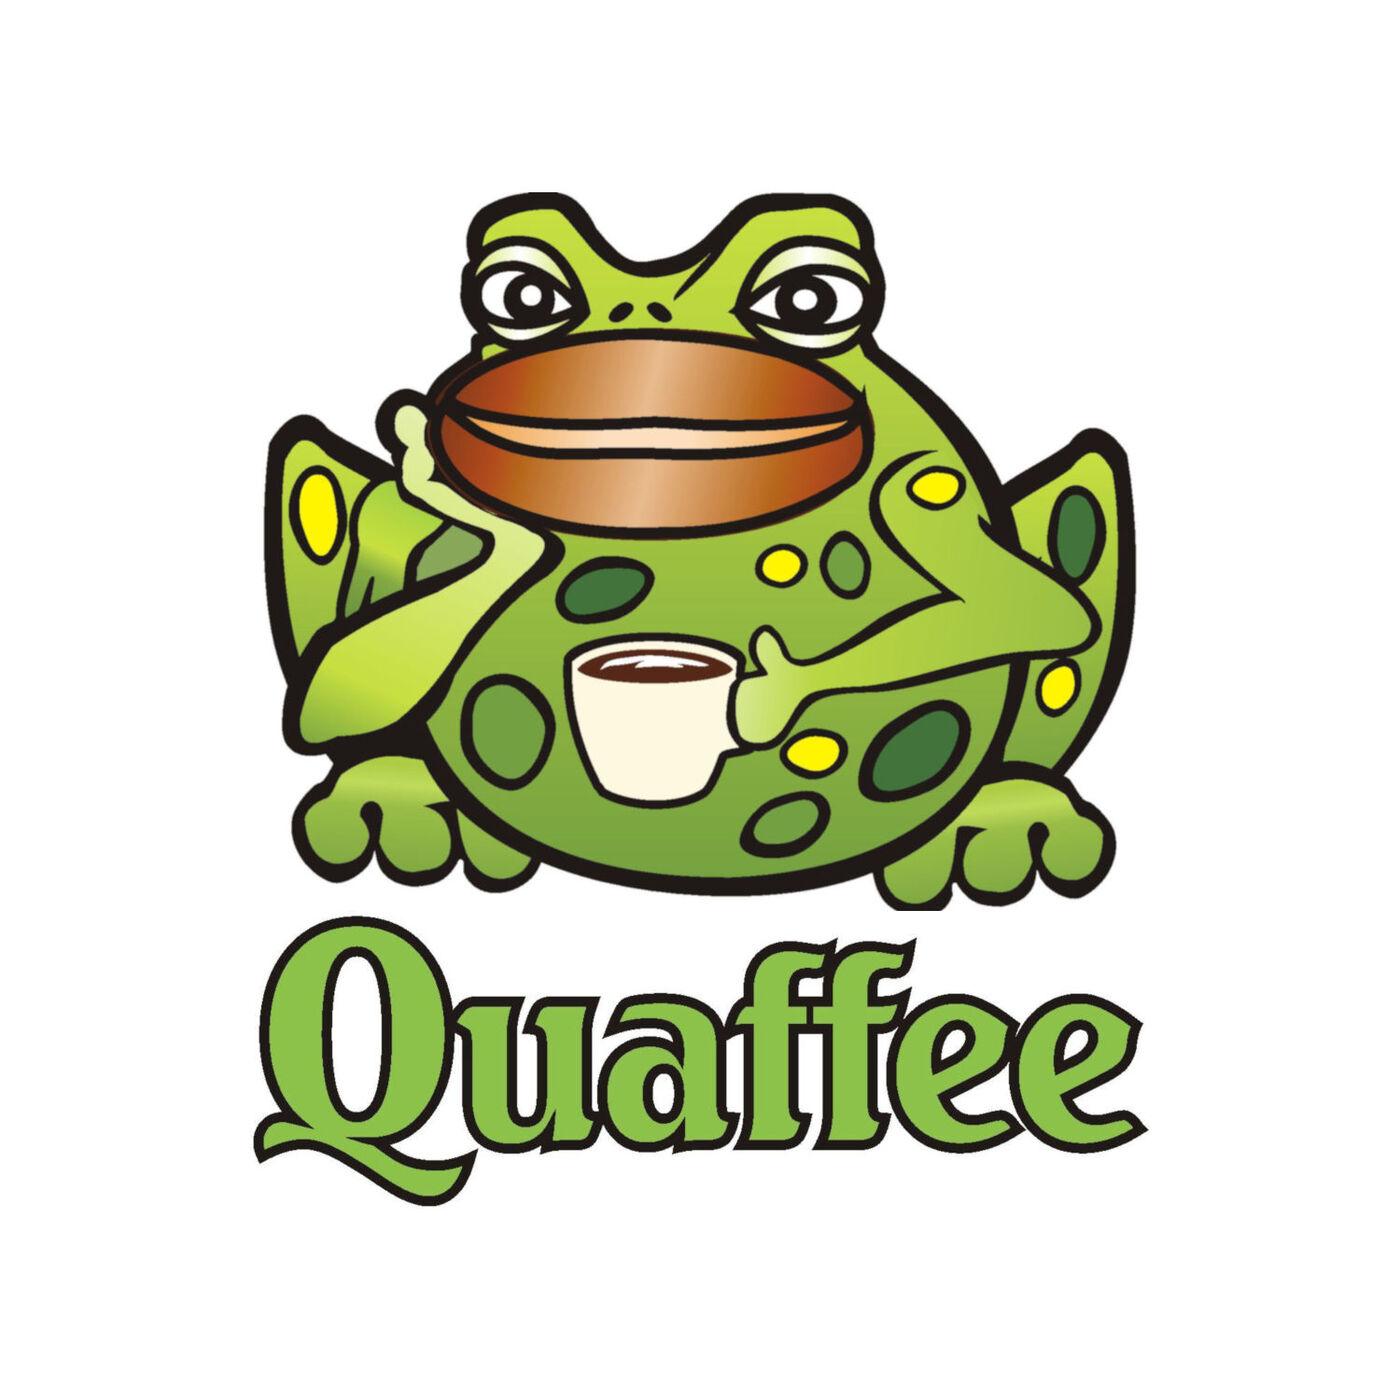 Episode 4 - Warren Machanik from Quaffee